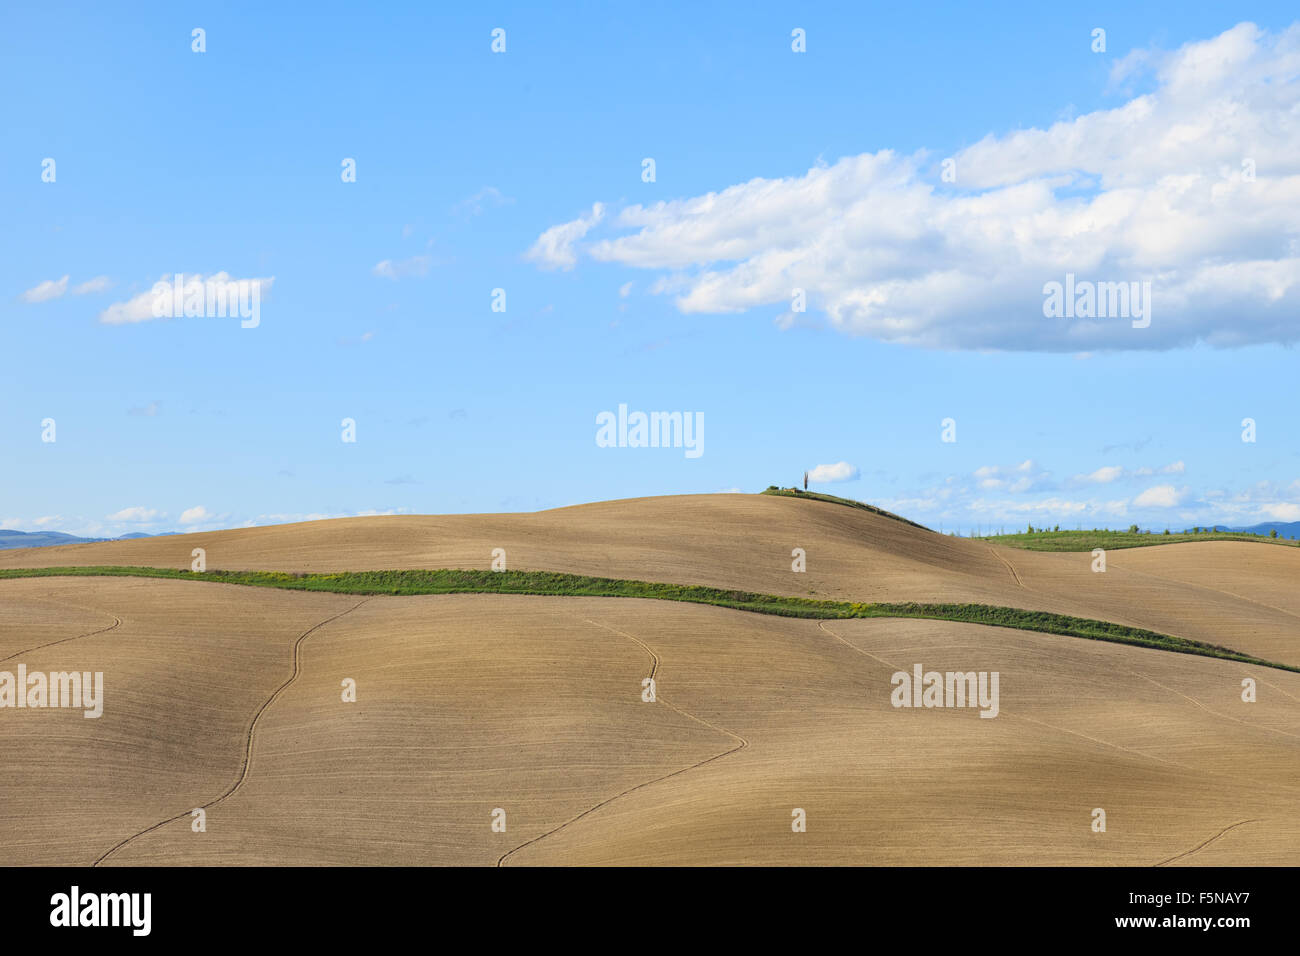 Tuscany, undulating plowed field, rural landscape in Crete Senesi, Italy, Europe. Subtle shadows, blue cloudy sky Stock Photo